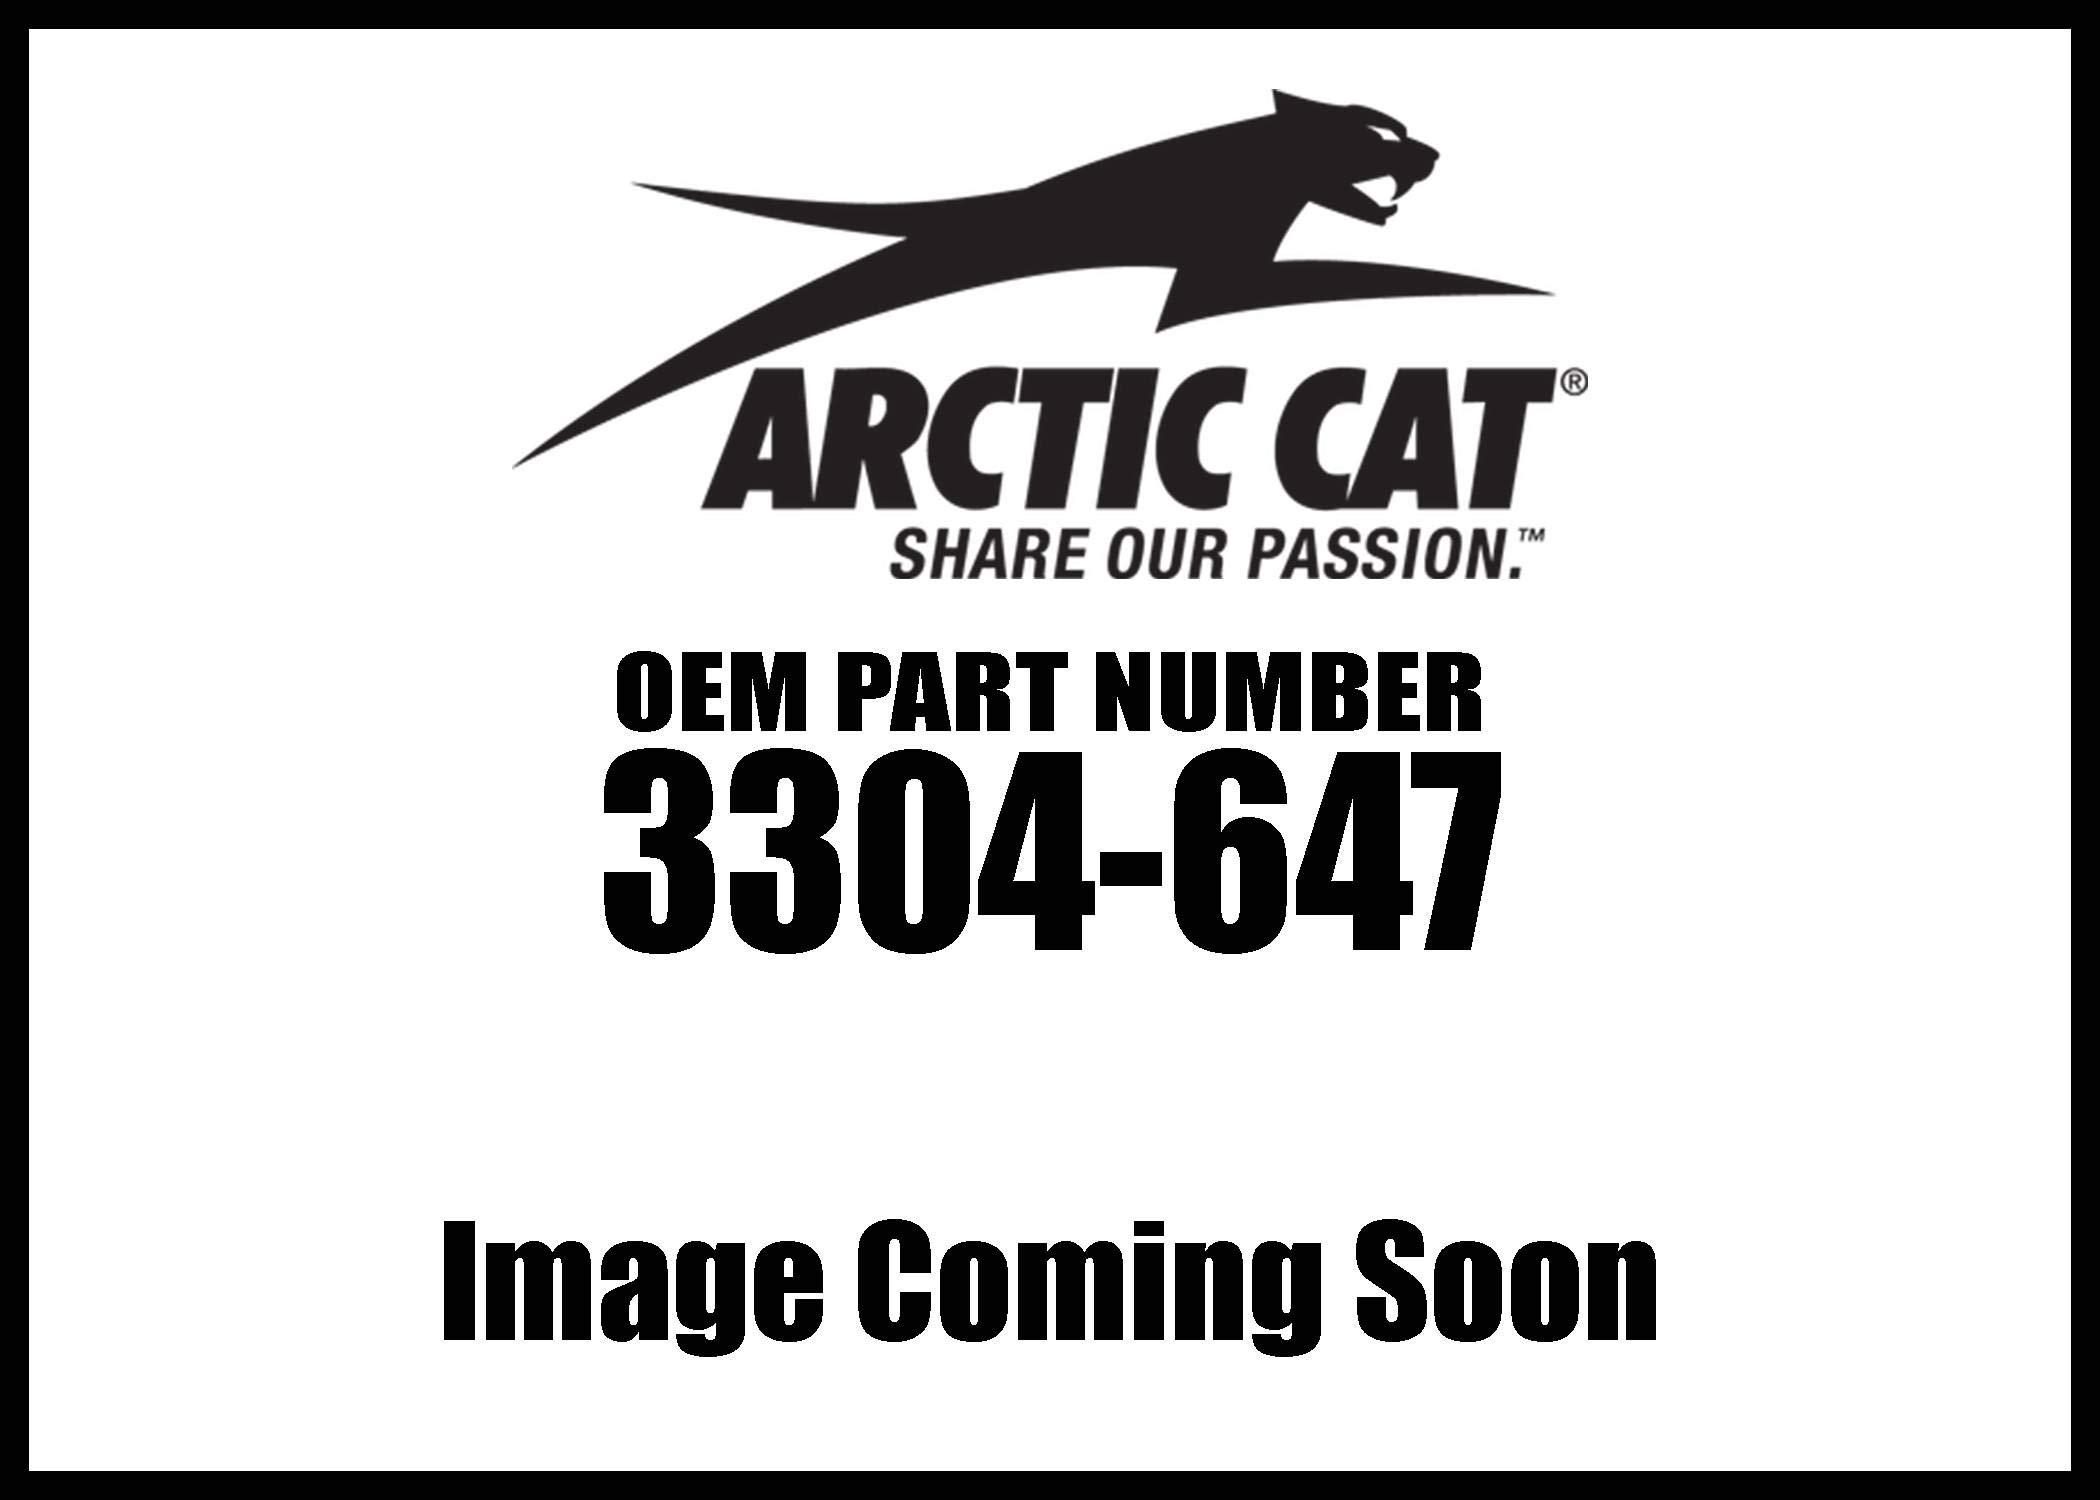 Arctic Cat 2006-2018 Atv 150 Utility Atv 300 2X4 Utility Rr Rubber Fuel Tank 3304-647 New Oem